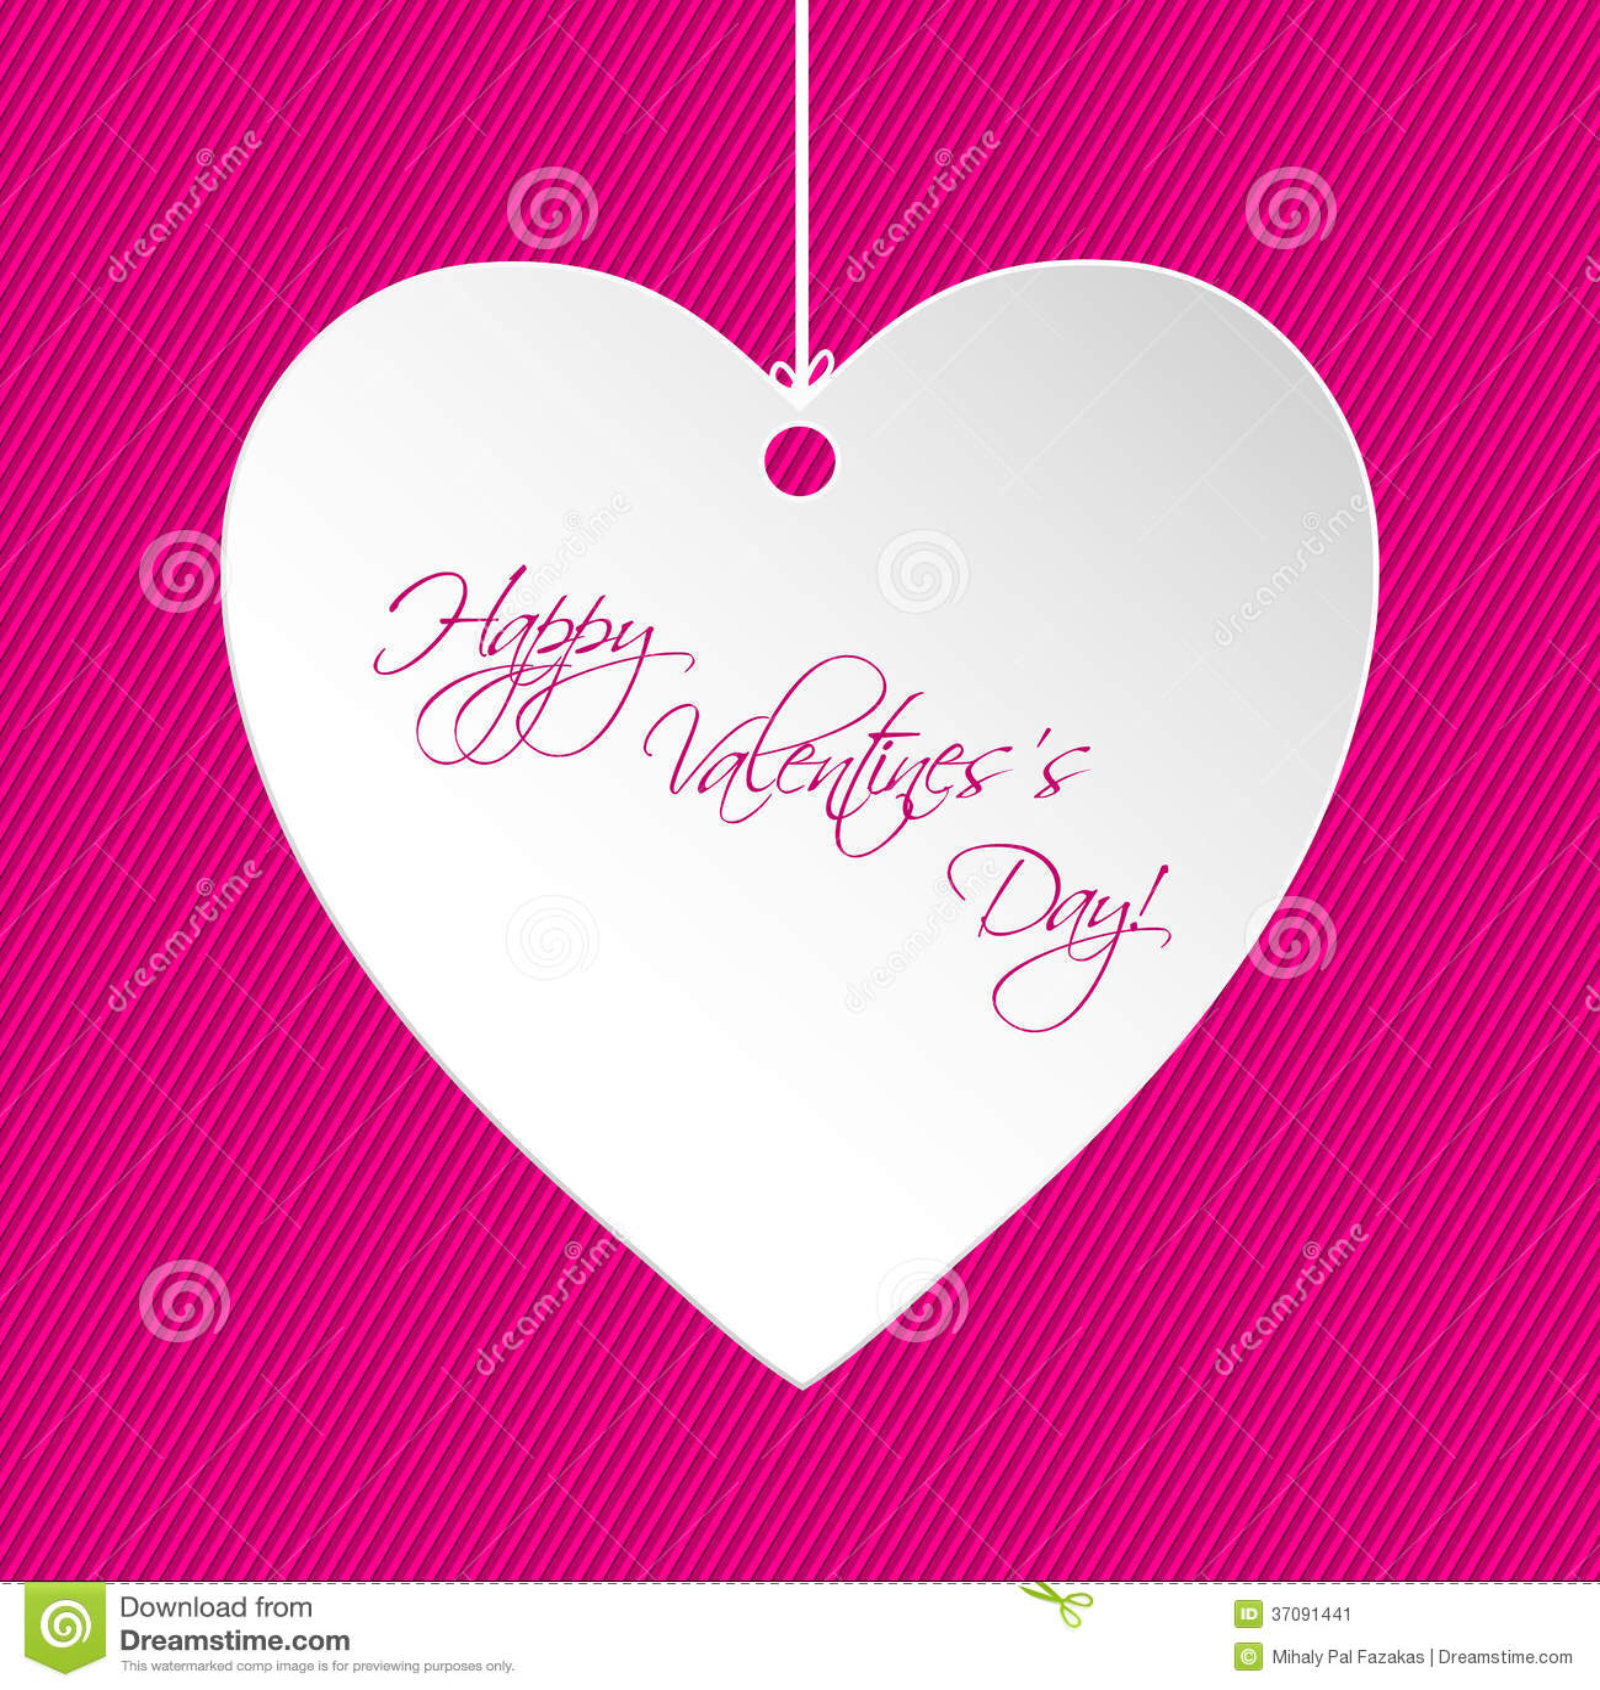 Valentine Heart Card Design Royalty Free Photo Image 23018805 – Valentine Heart Card